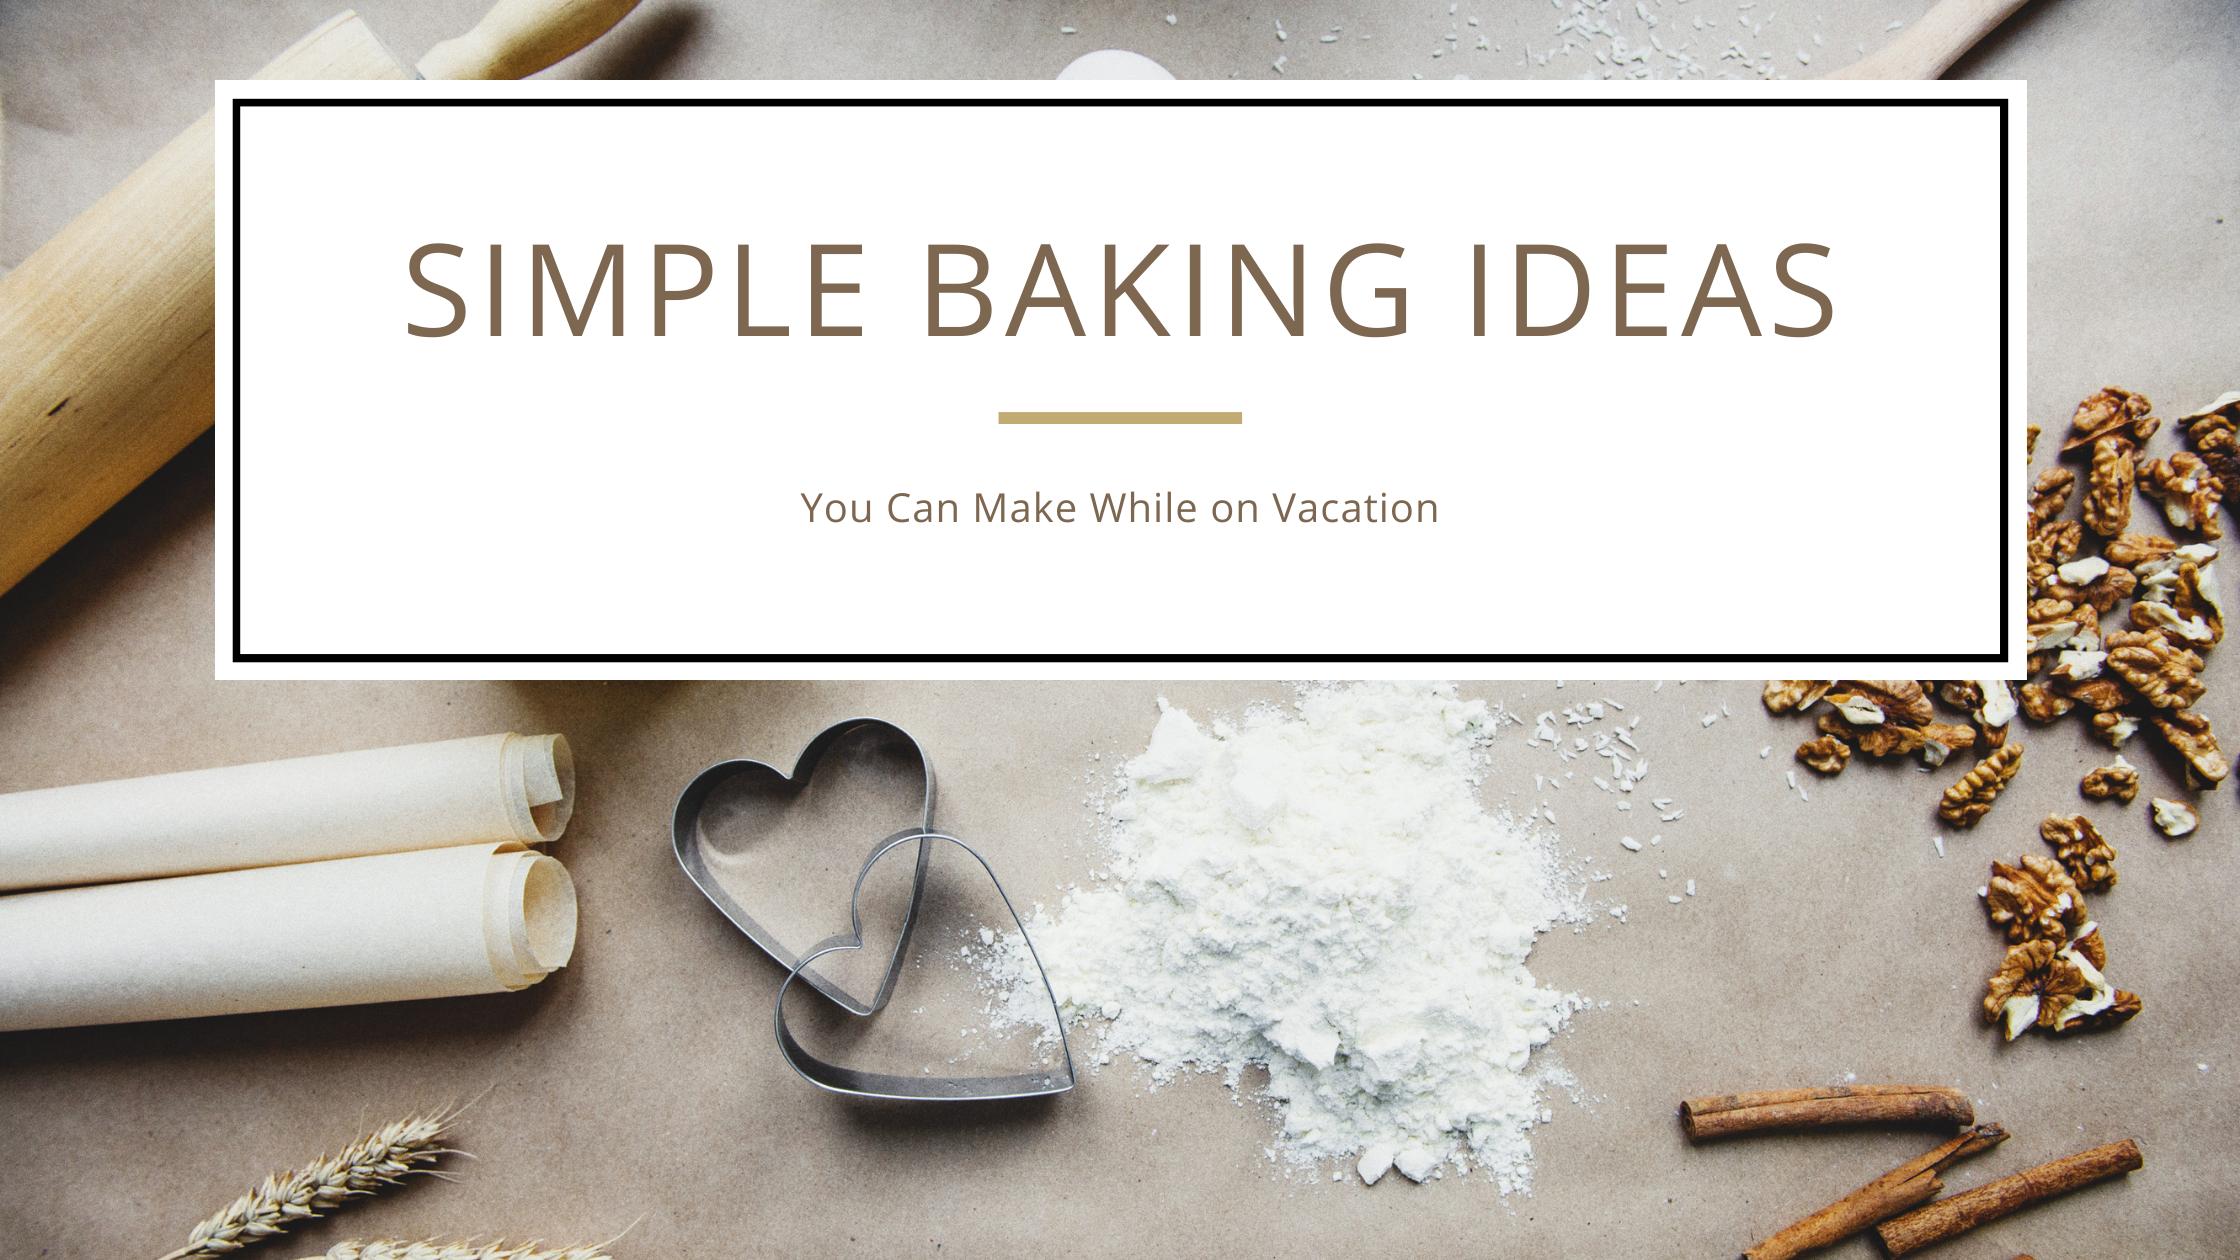 Simple Baking Ideas